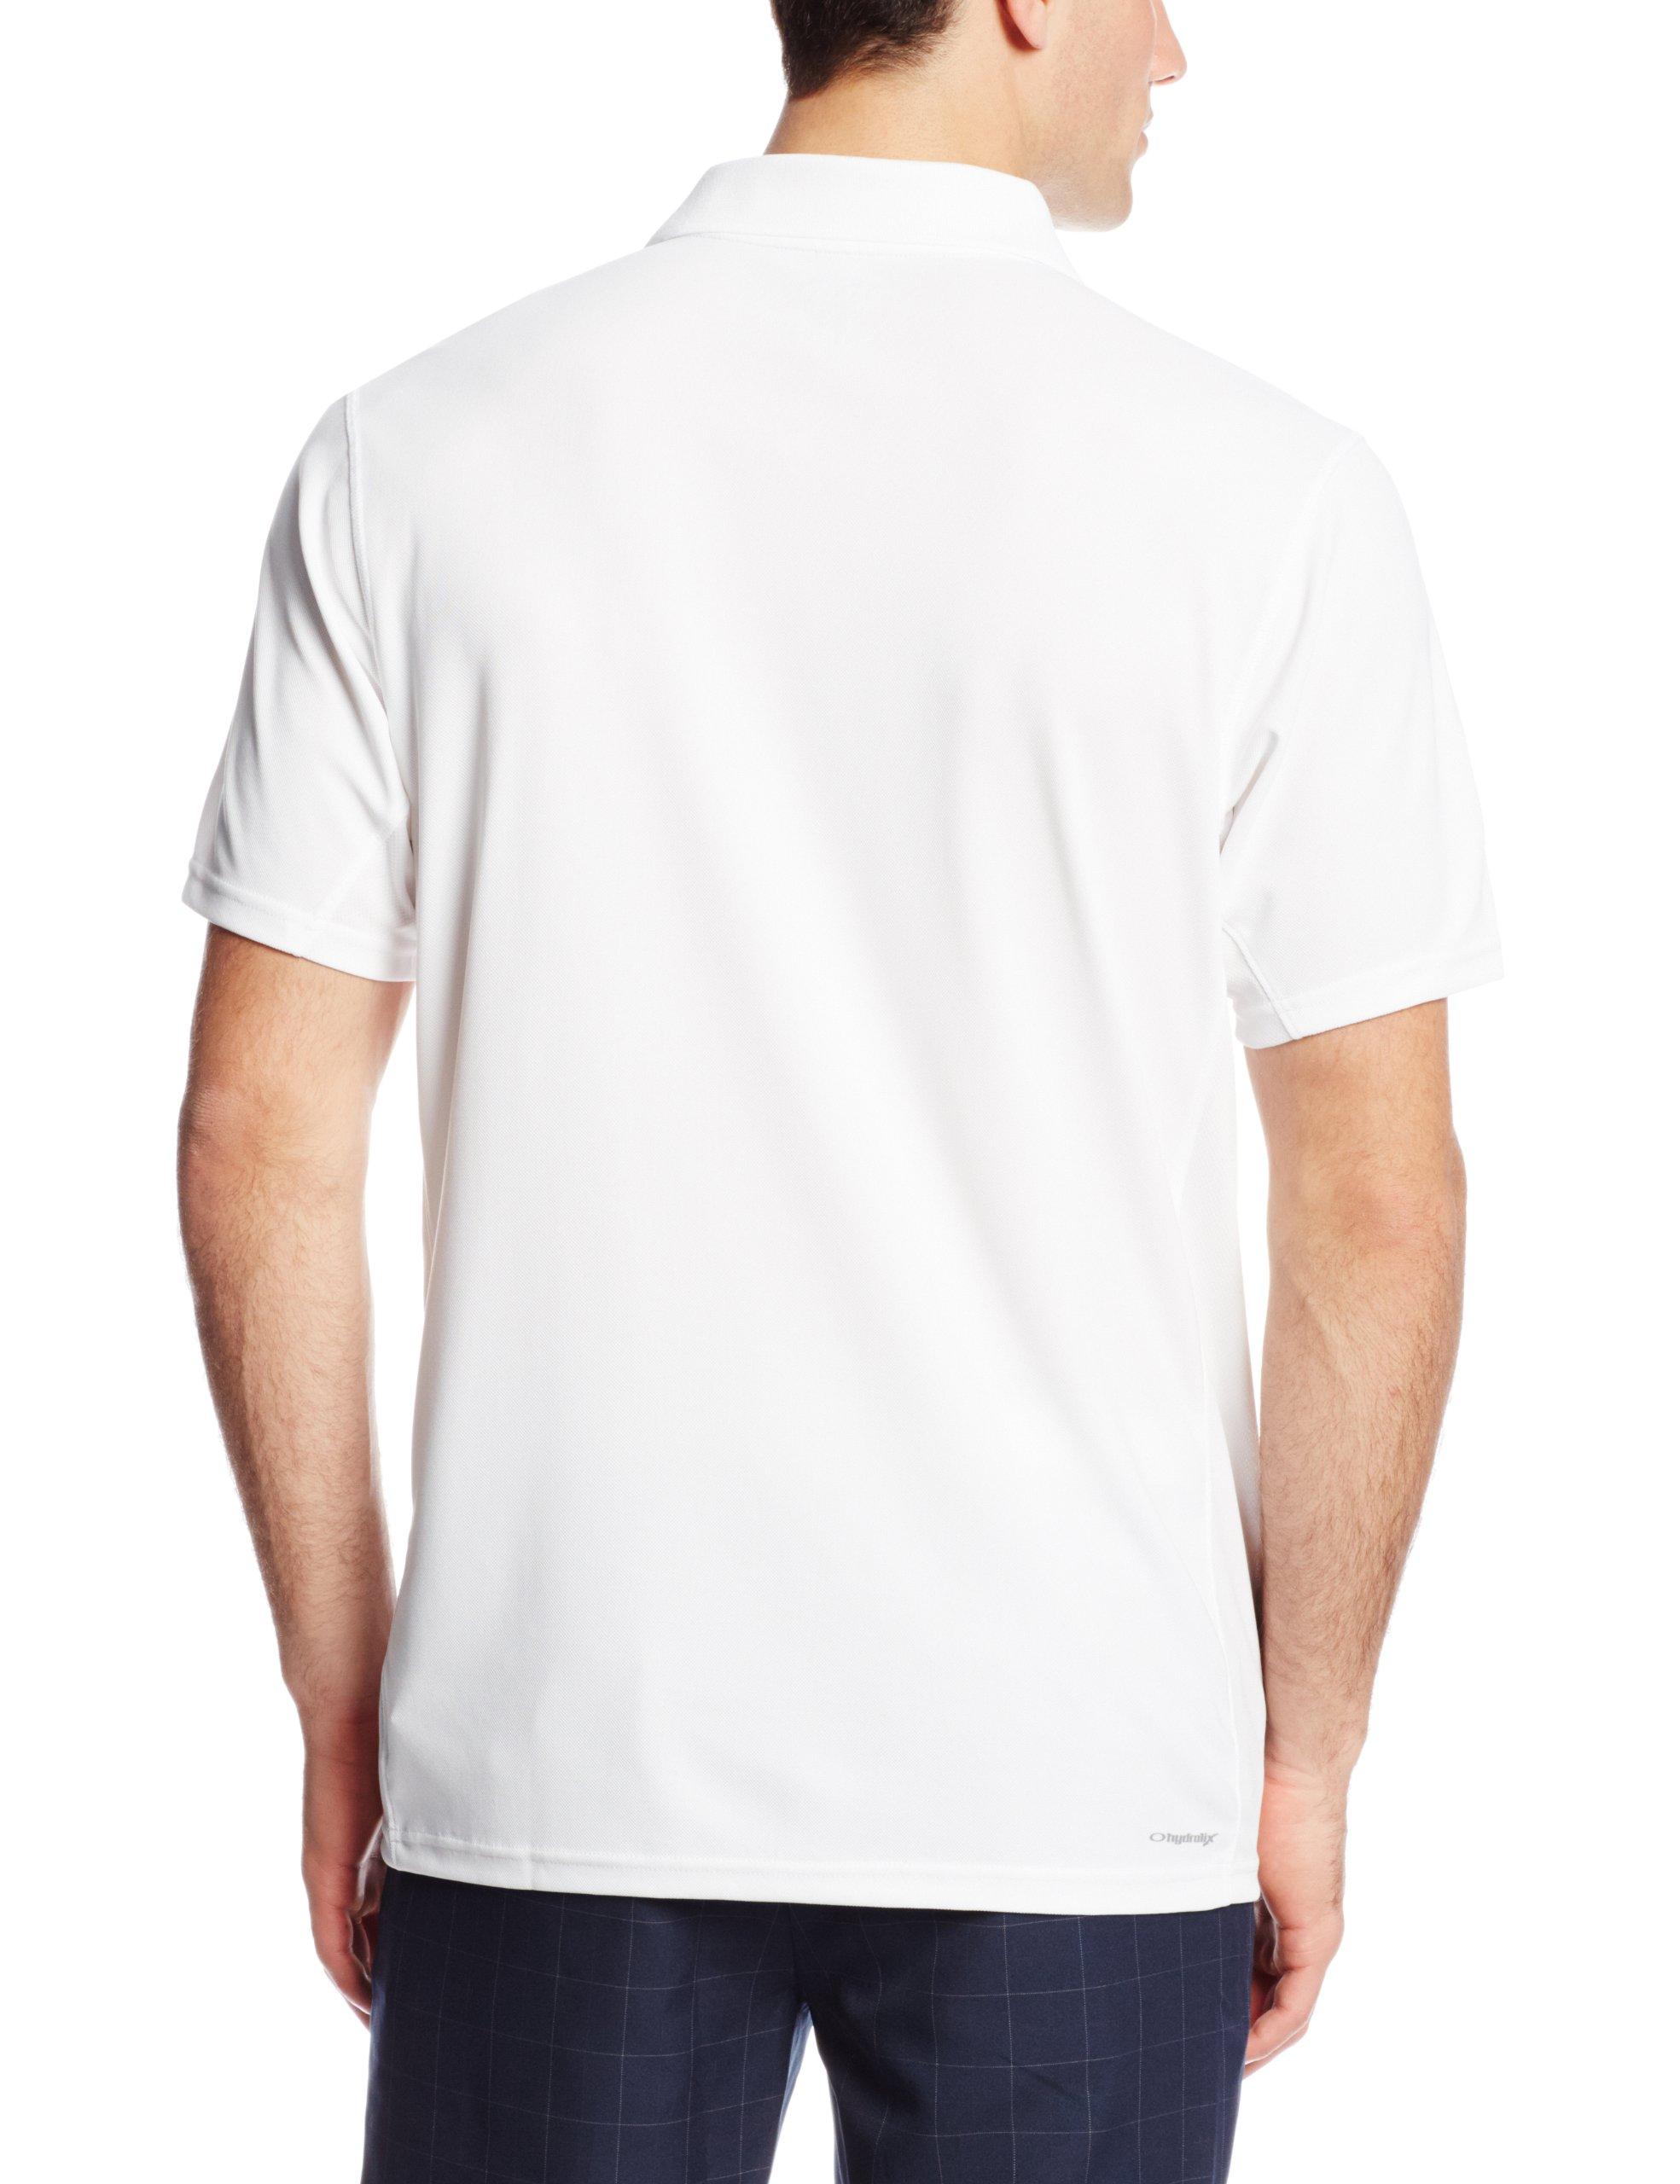 Oakley Men's Chapman Polo image https://media.buyr.com/_vHLK3XOLkokdTcQrWK8YA-cmSGI06VtOpoVNvjtt7-Qg.jpg1